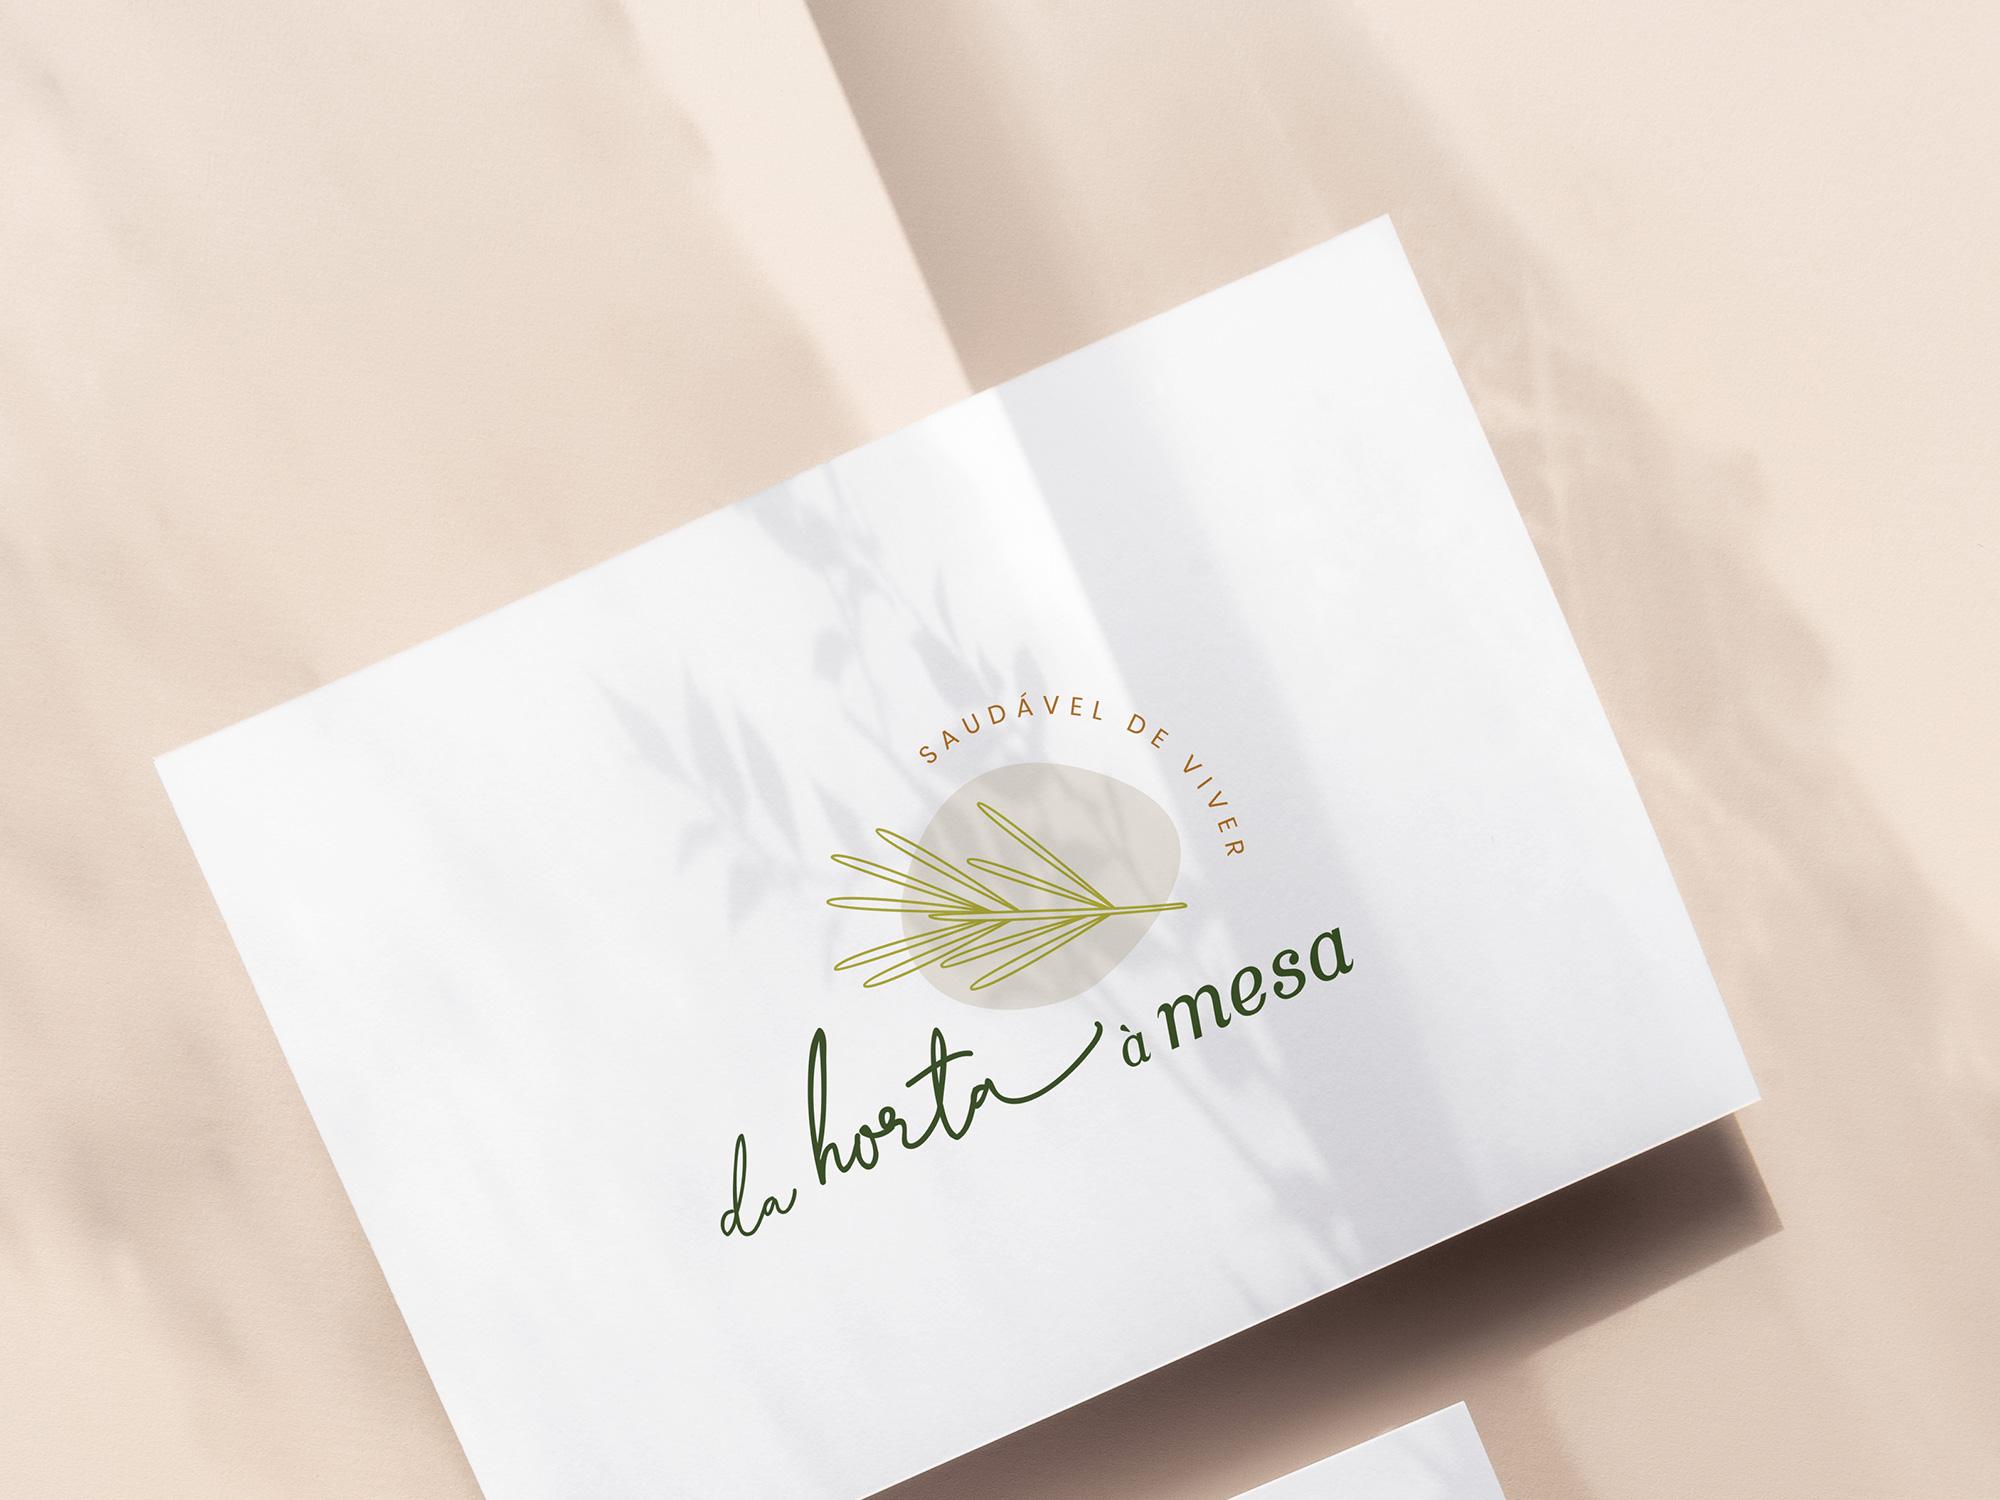 Identidade Visual exclusiva para Da Horta à Mesa - Design by Adrielly Sato